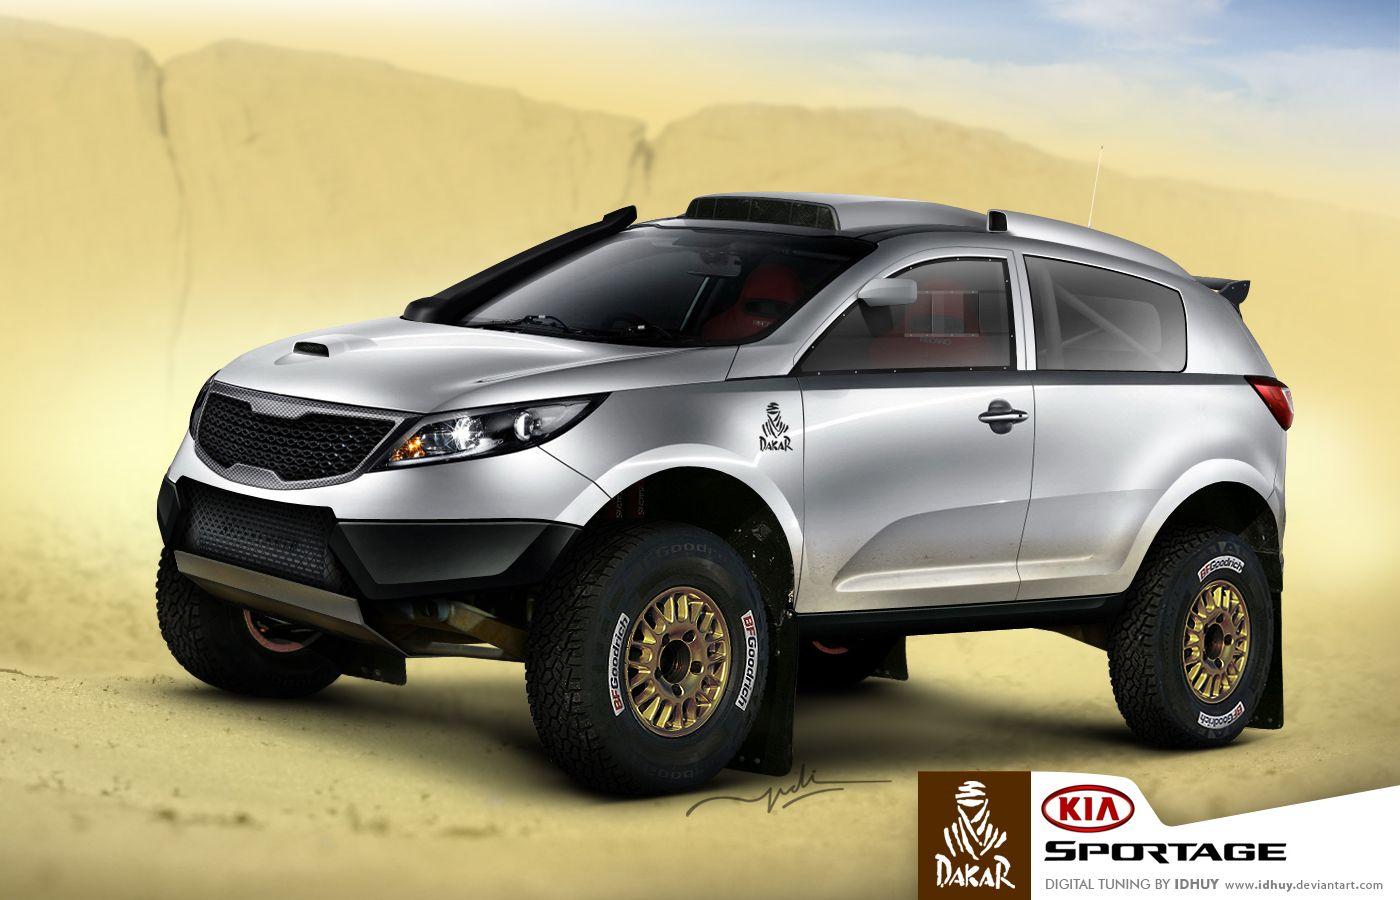 Kia Sportage Rally Google Search Coches Y Motocicletas Autos Coches